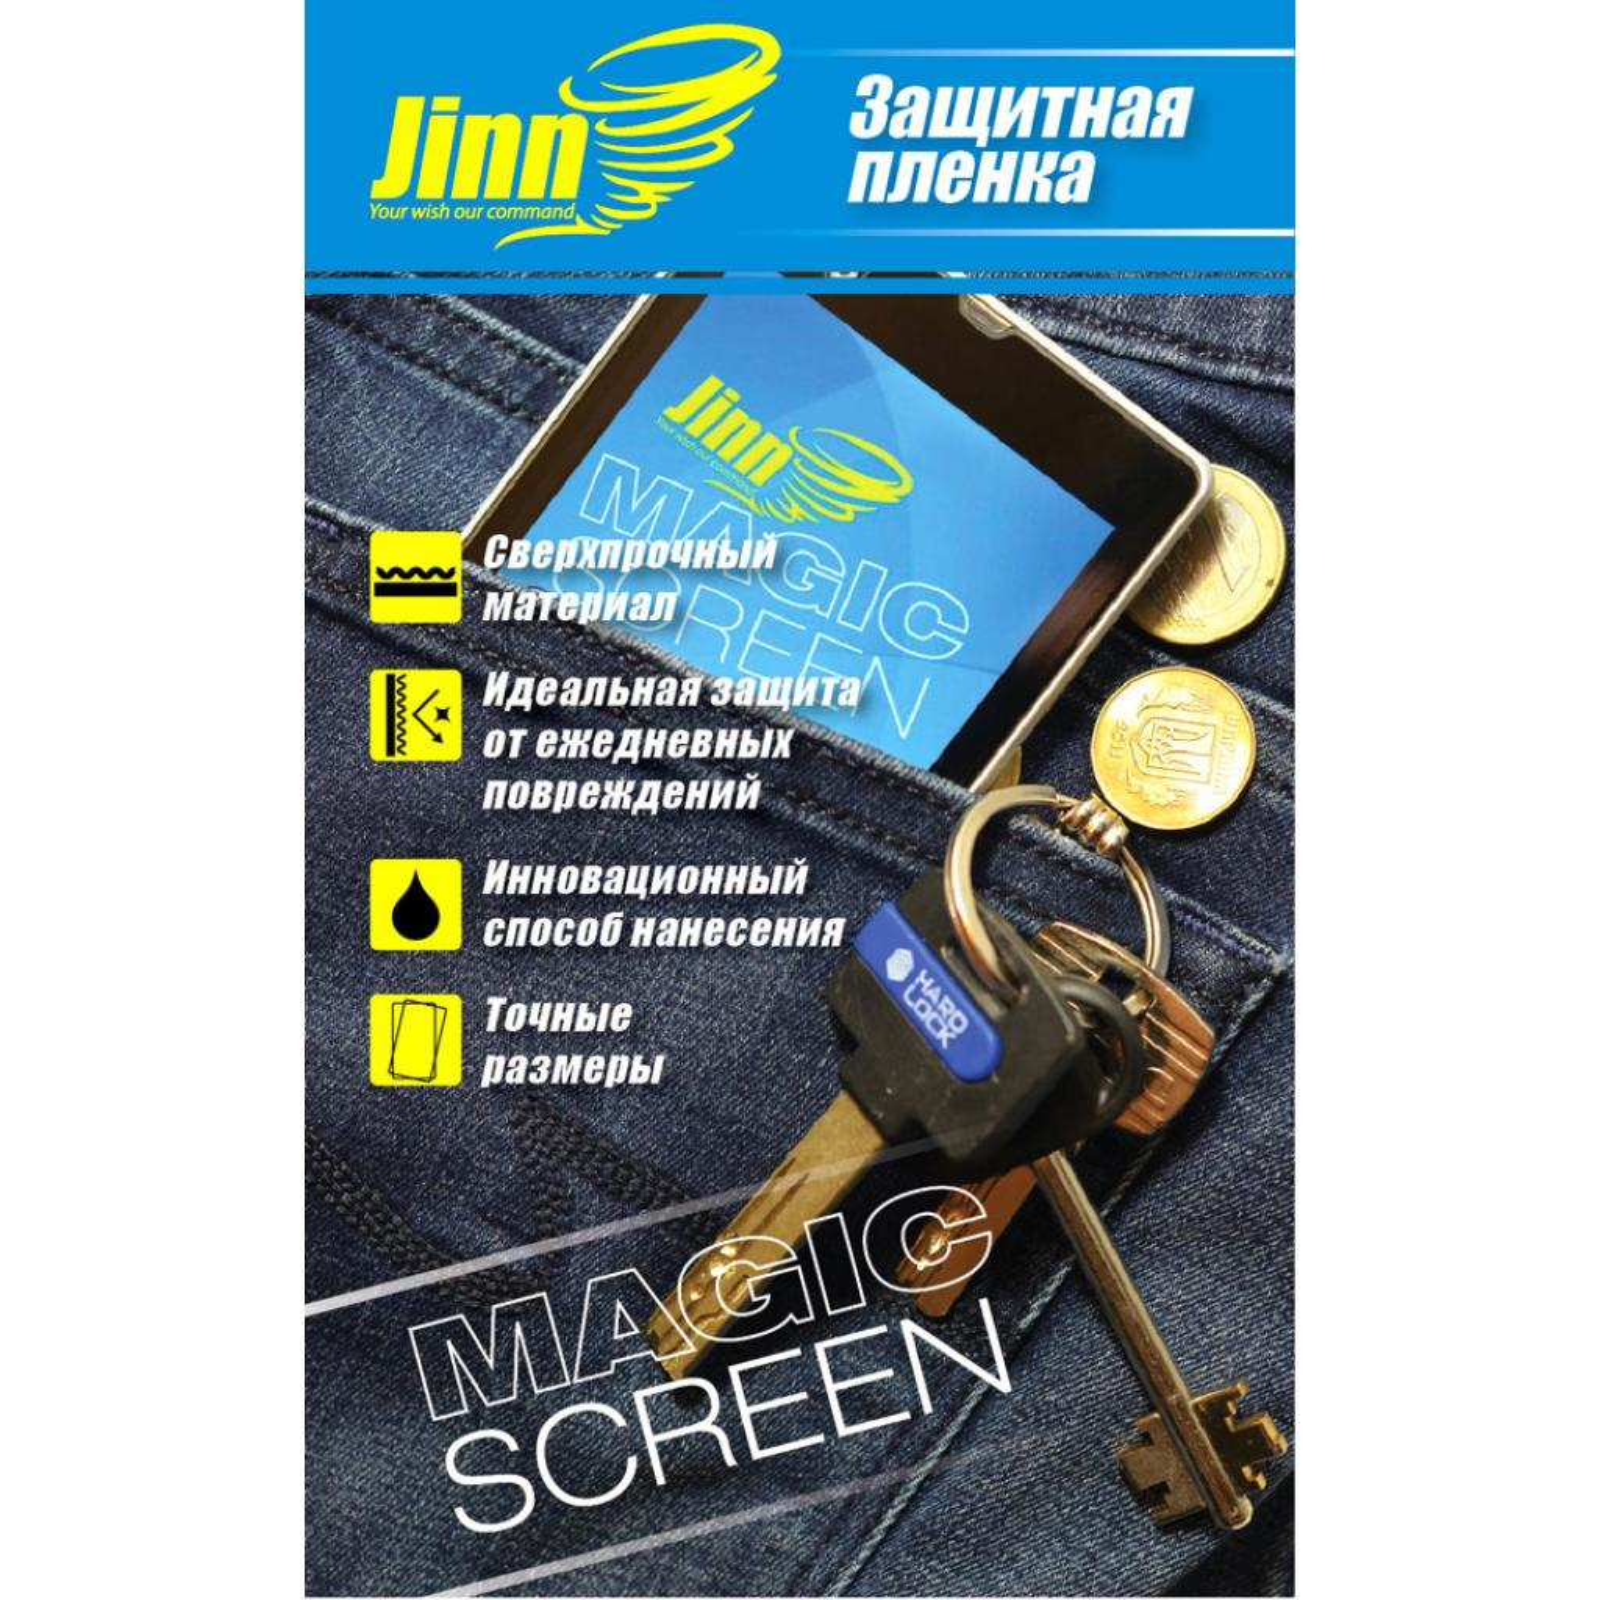 Пленка защитная JINN ультрапрочная Magic Screen для Lenovo IdeaPhone A880 (Lenovo IdeaPhone A880 front)